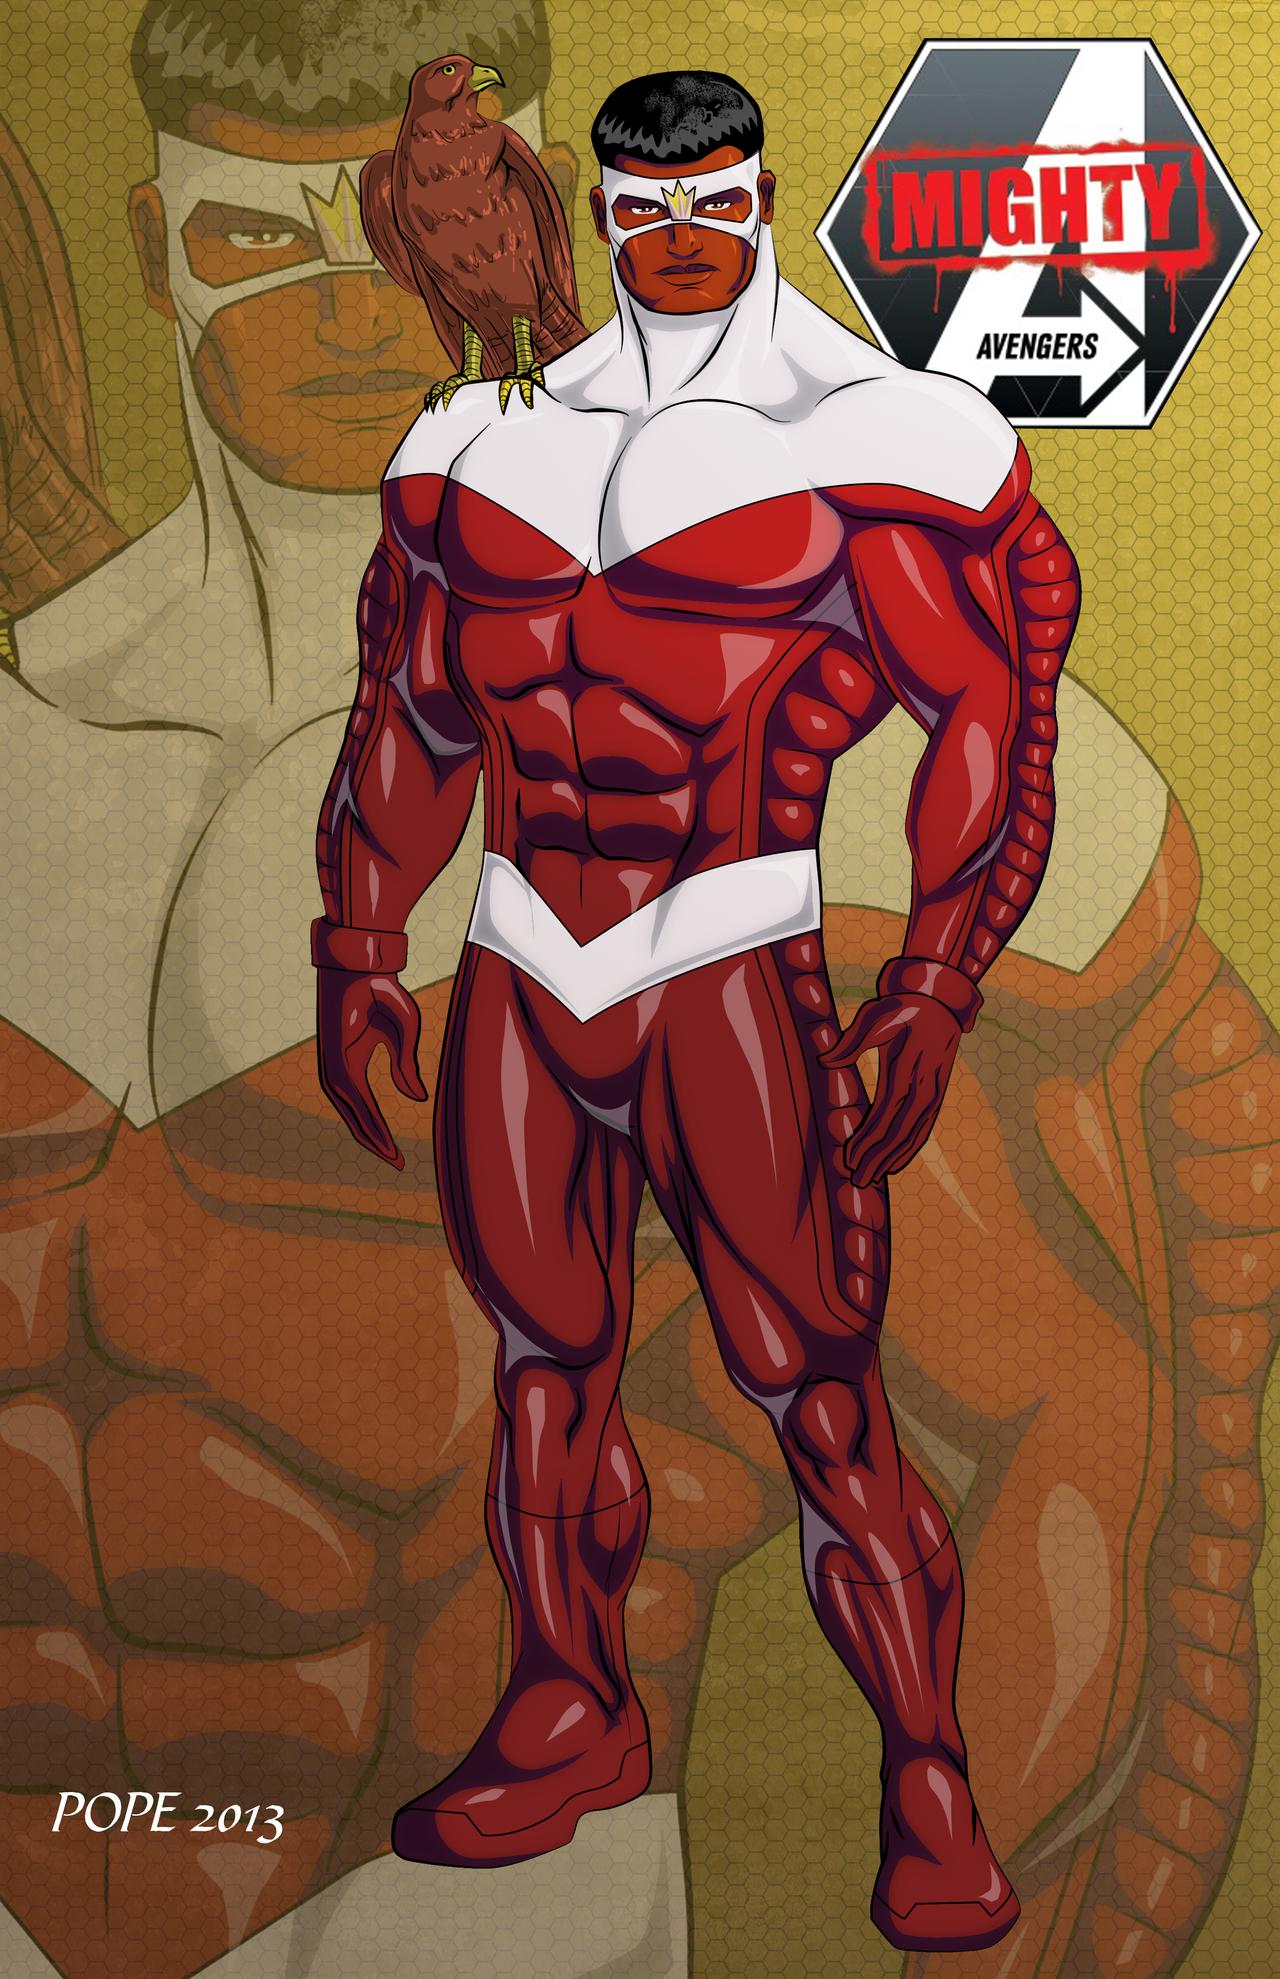 Avengers falcon by hulkdaddyg on deviantart - Faucon avengers ...